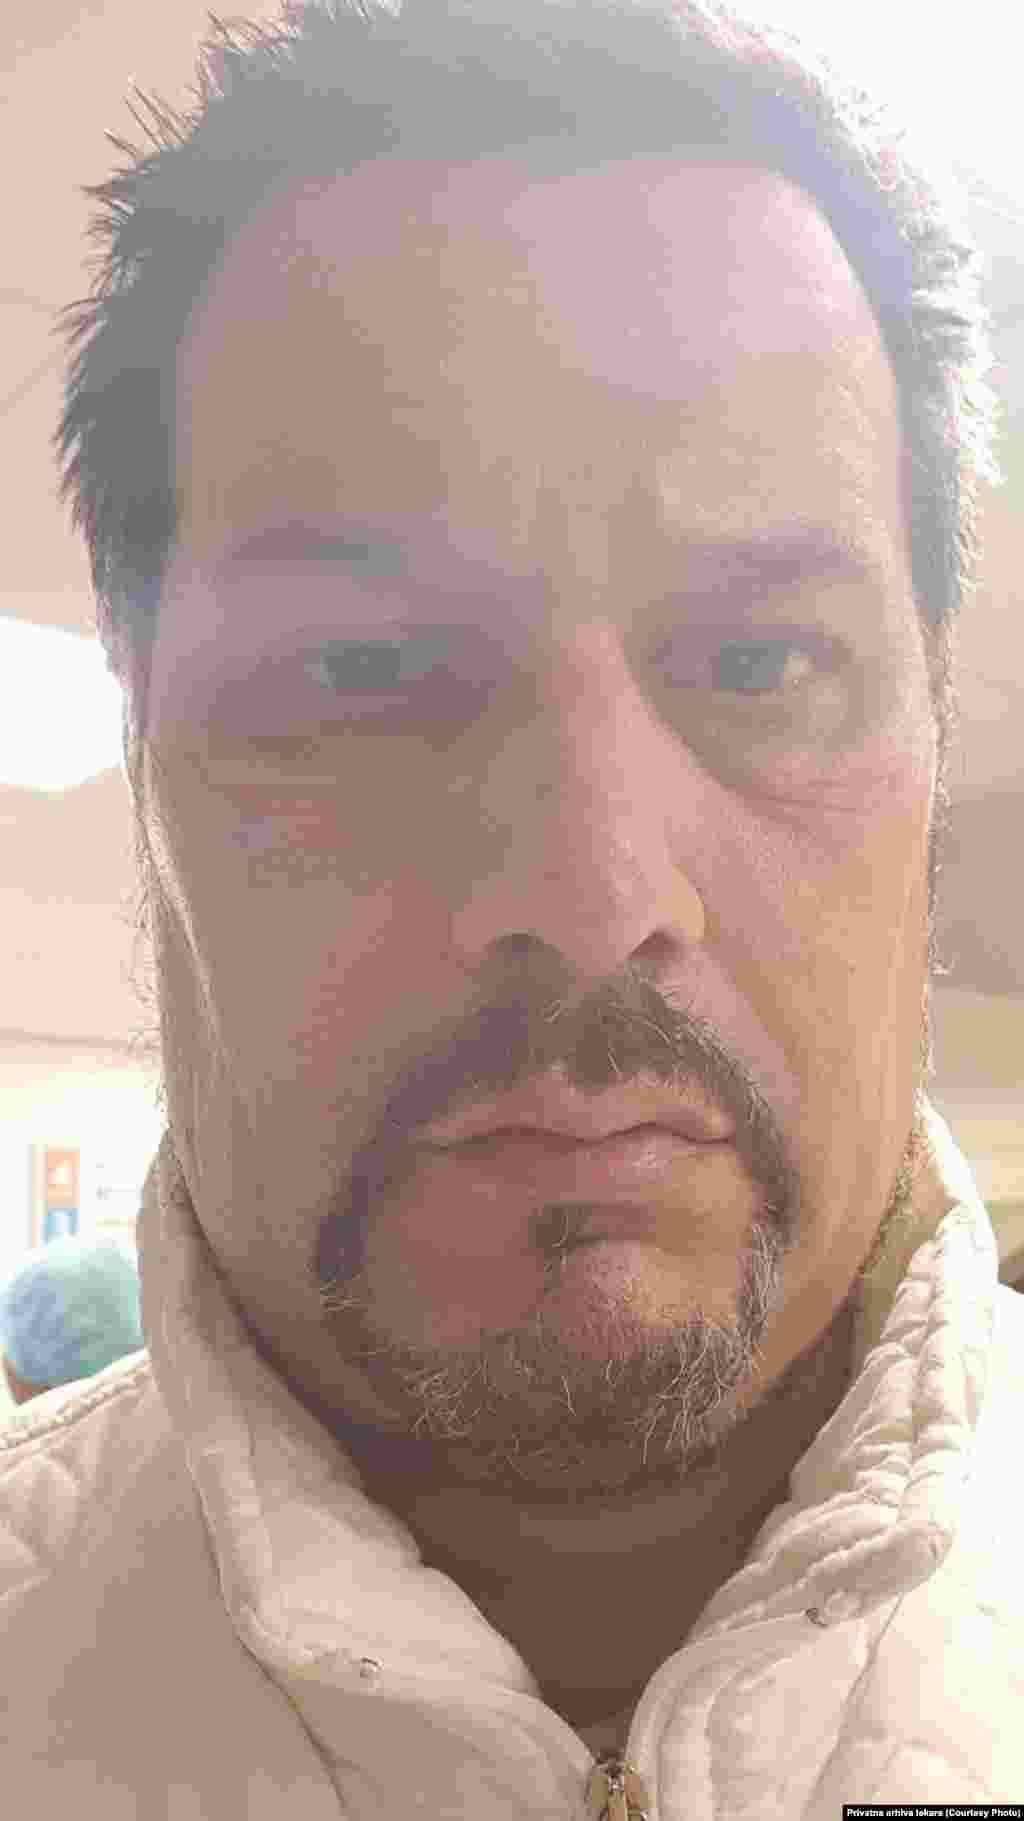 Doktor Radomir Janković na pauzi između smena, COVID bolnica Kliničkog centra u Nišu